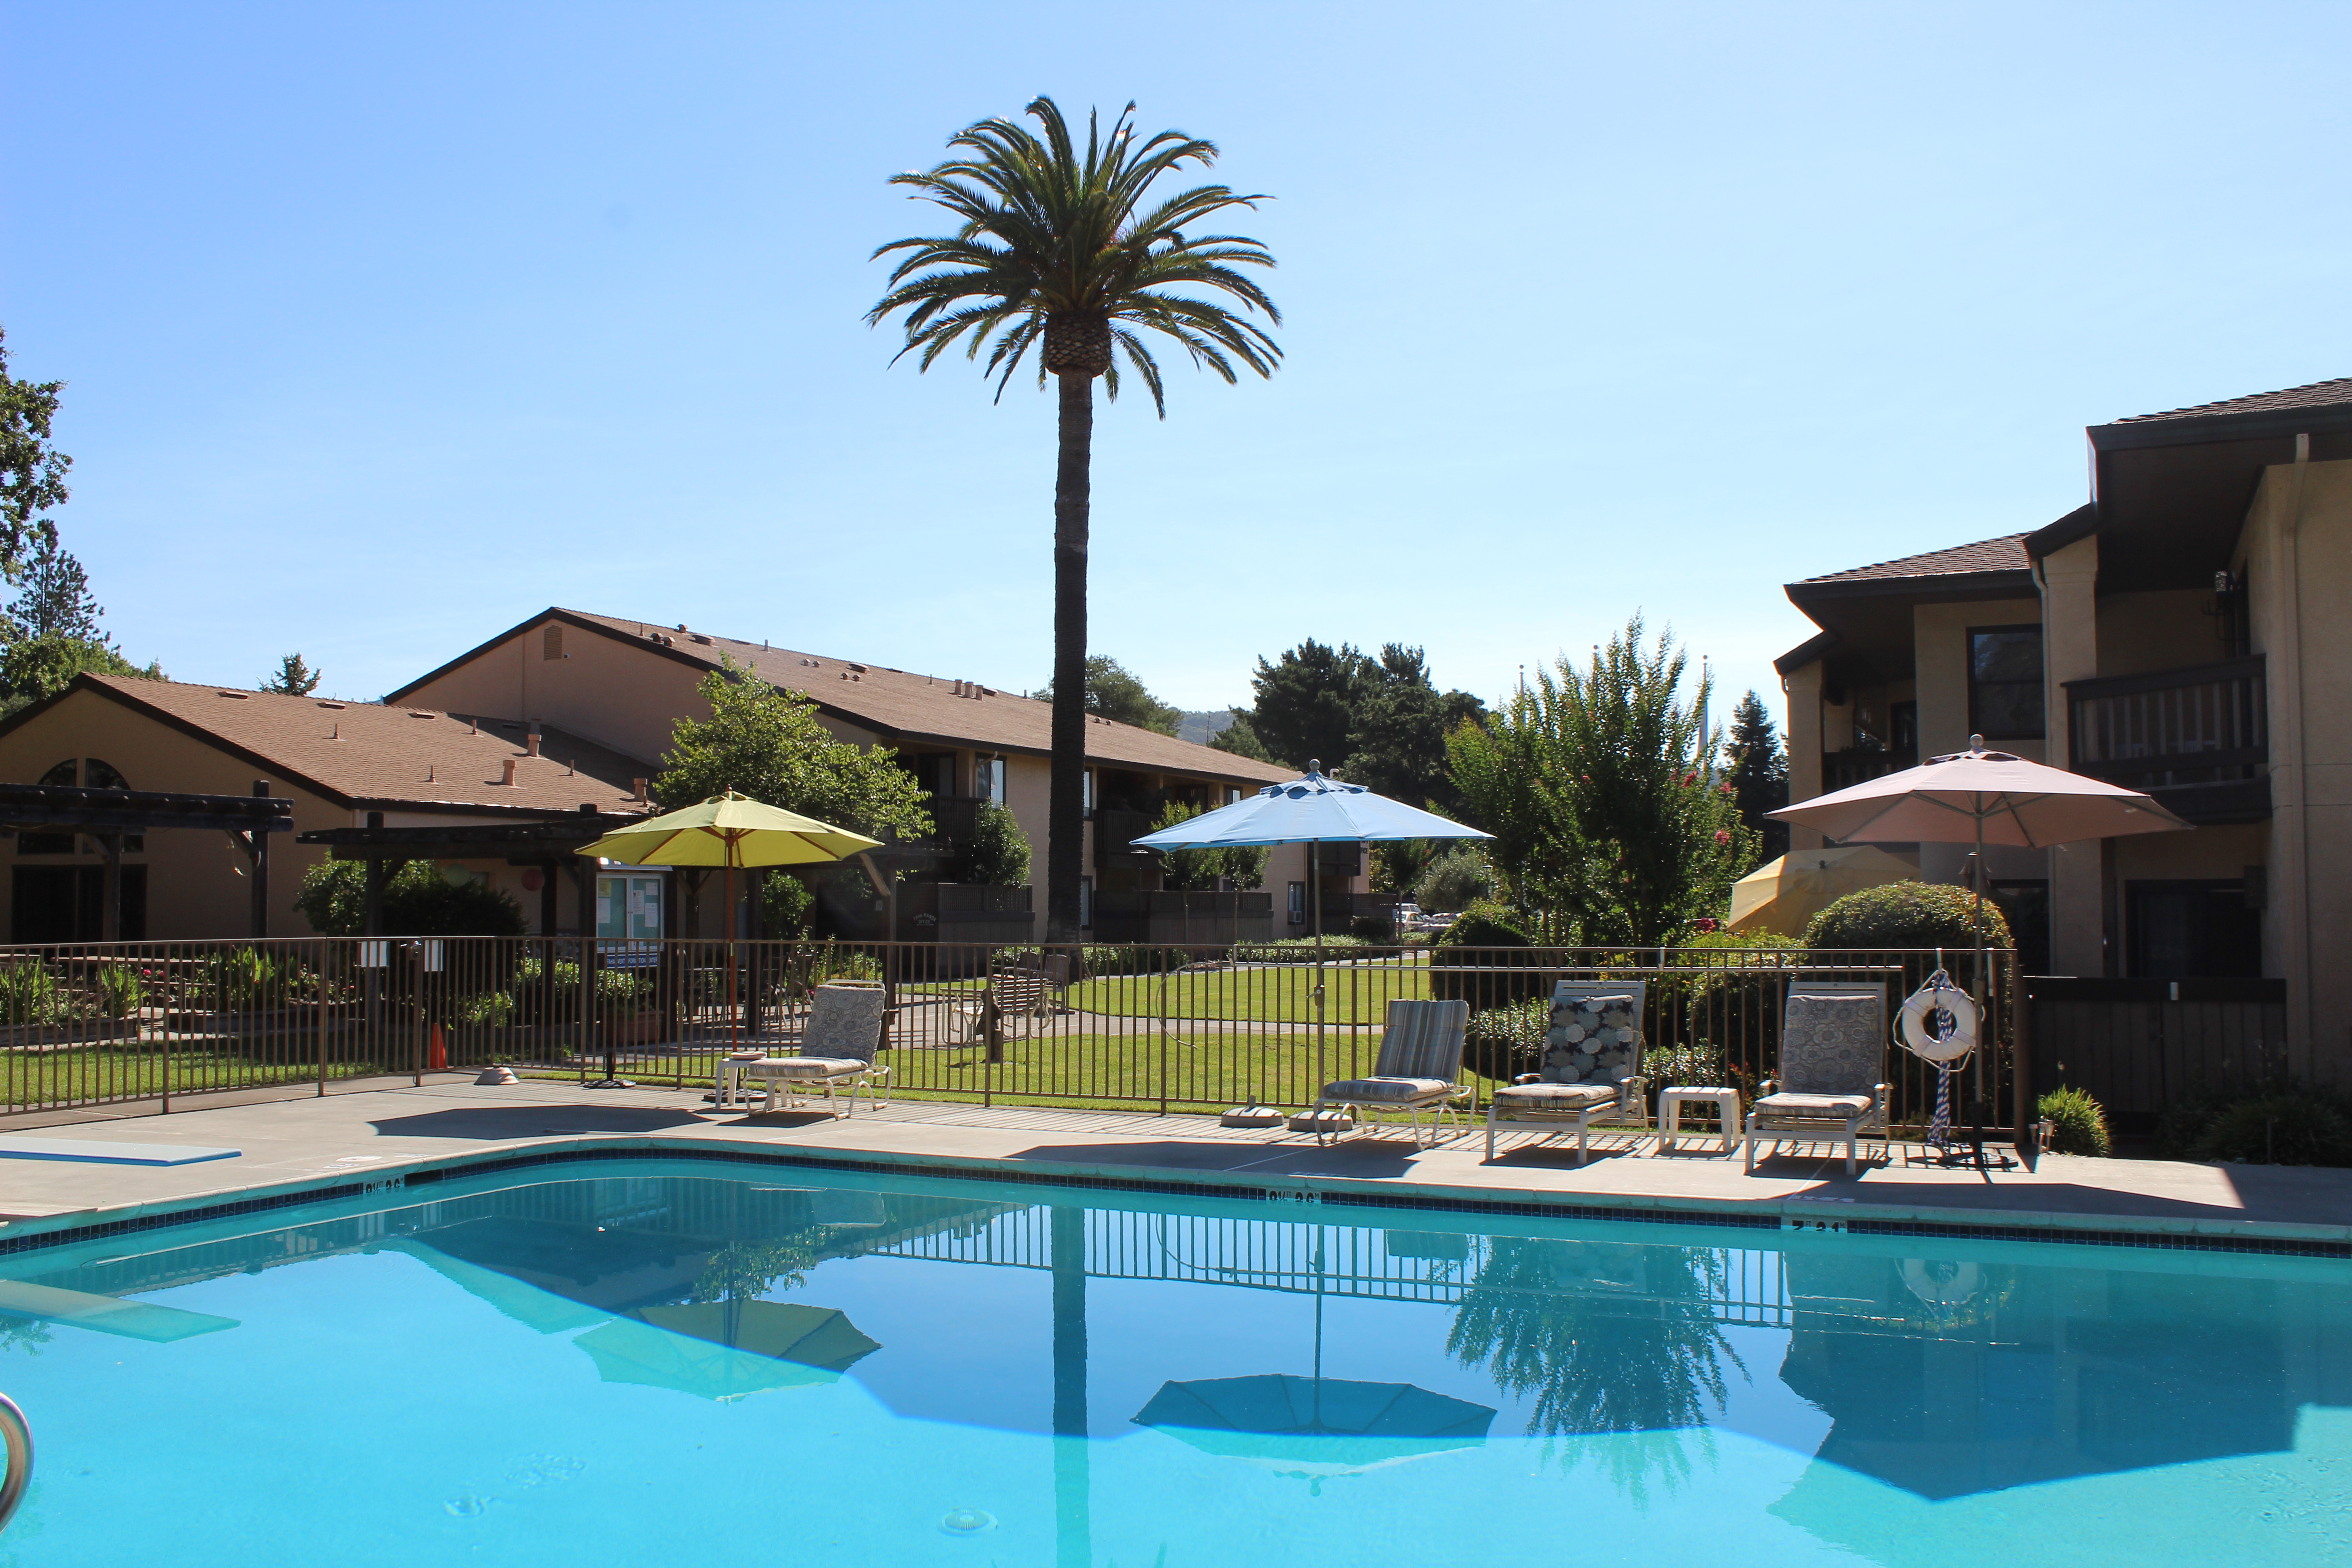 FAHA Pool